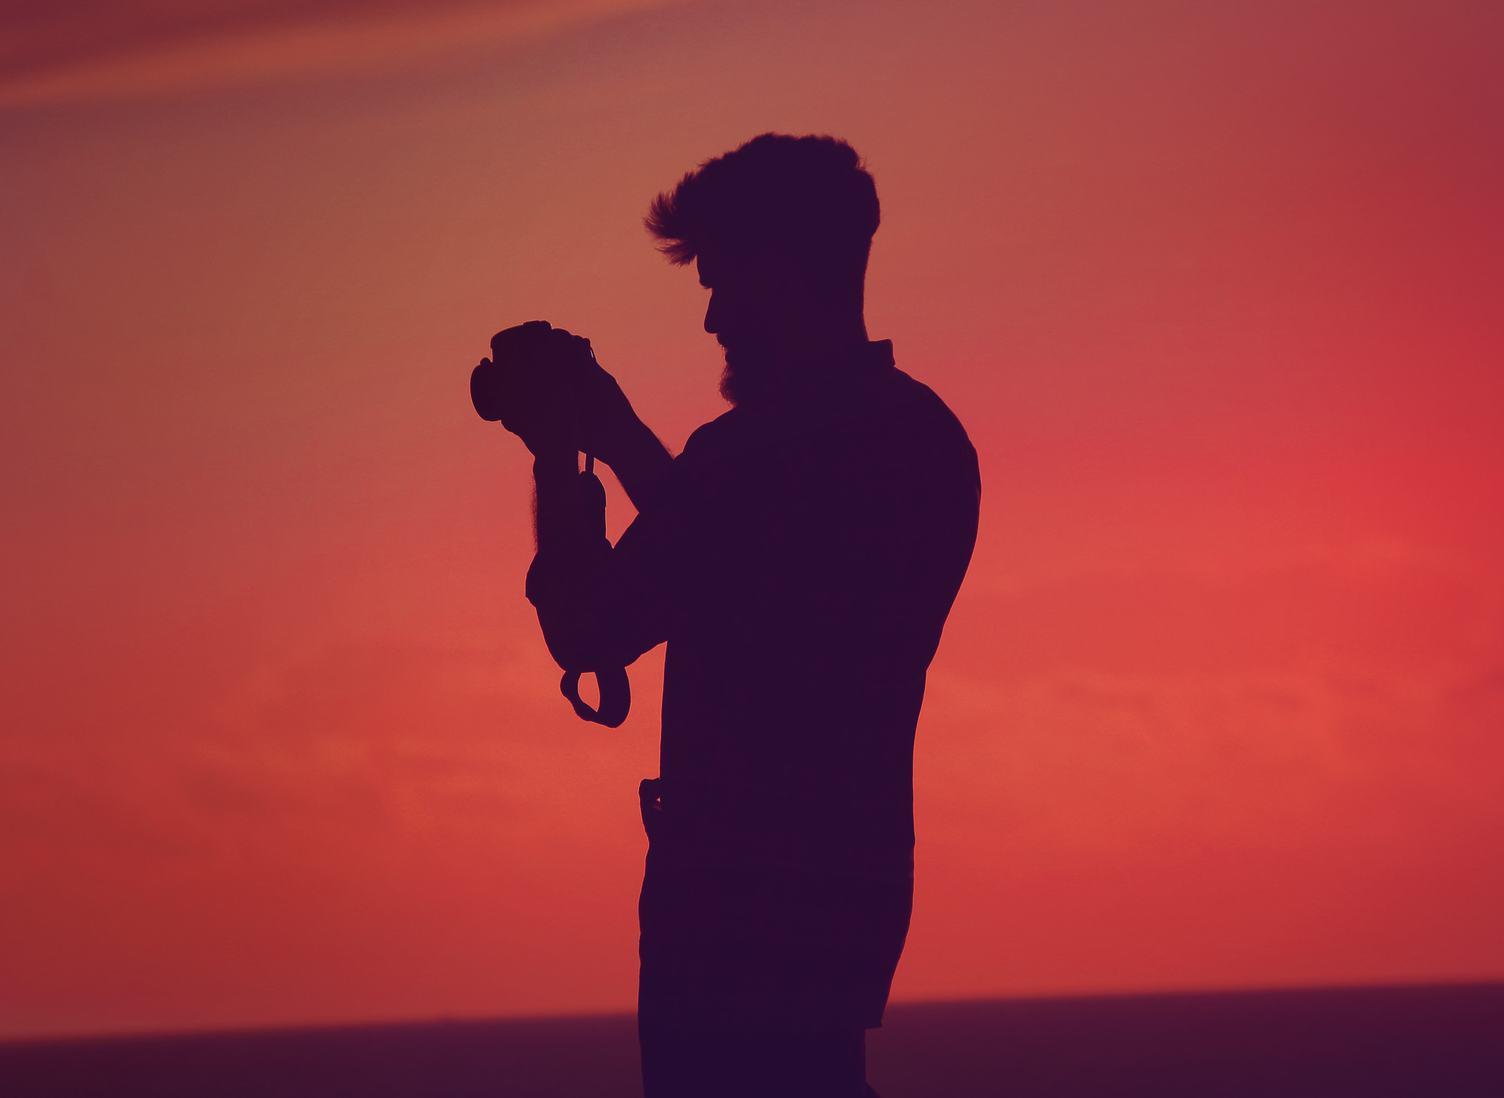 Bearded Man Silhouette Holding Camera